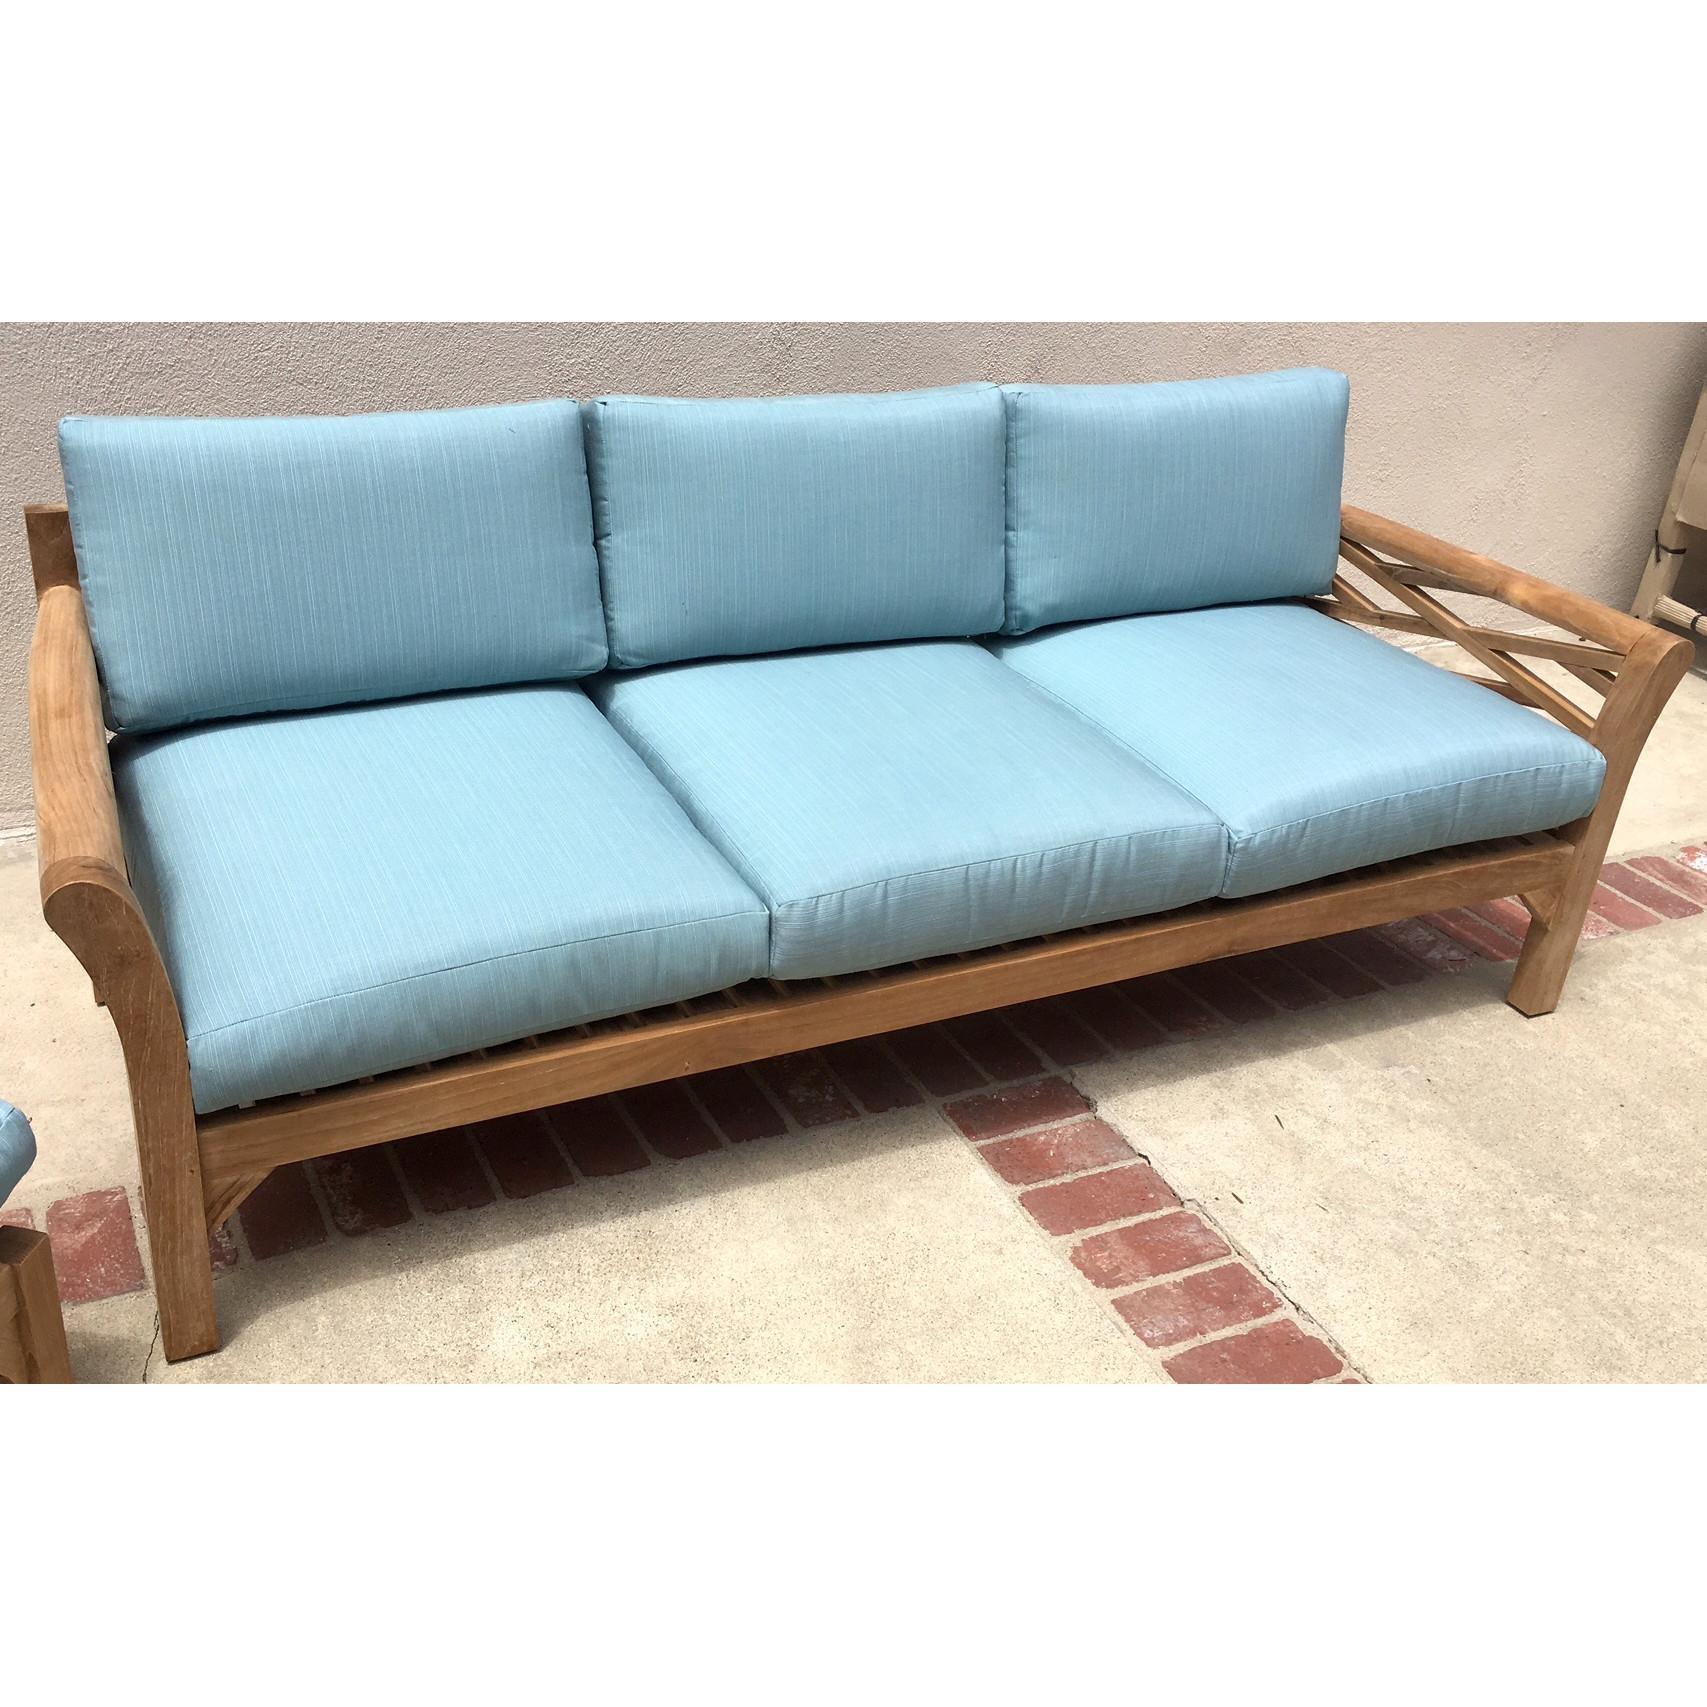 20 Ideas of Deep Cushion Sofa